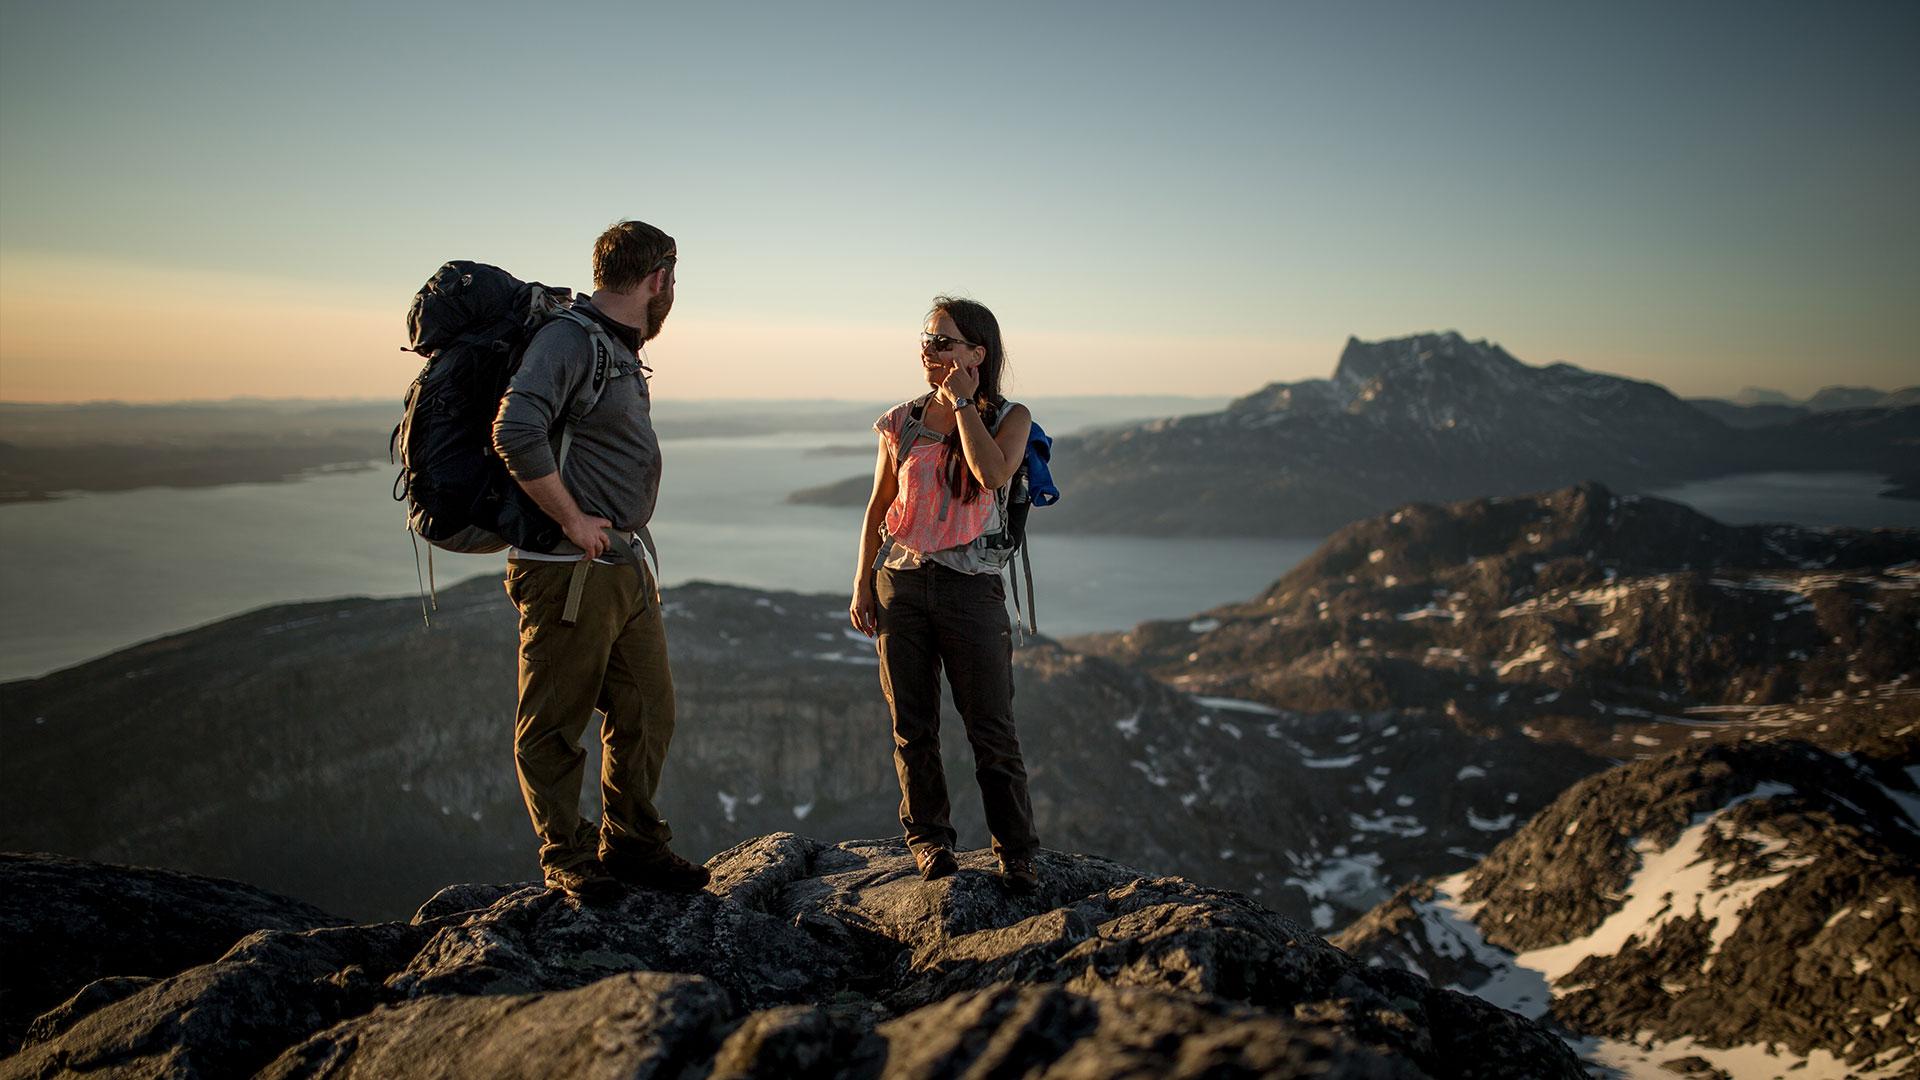 Greenland Guided Hiking & Trekking Tours : Hiking Breaks